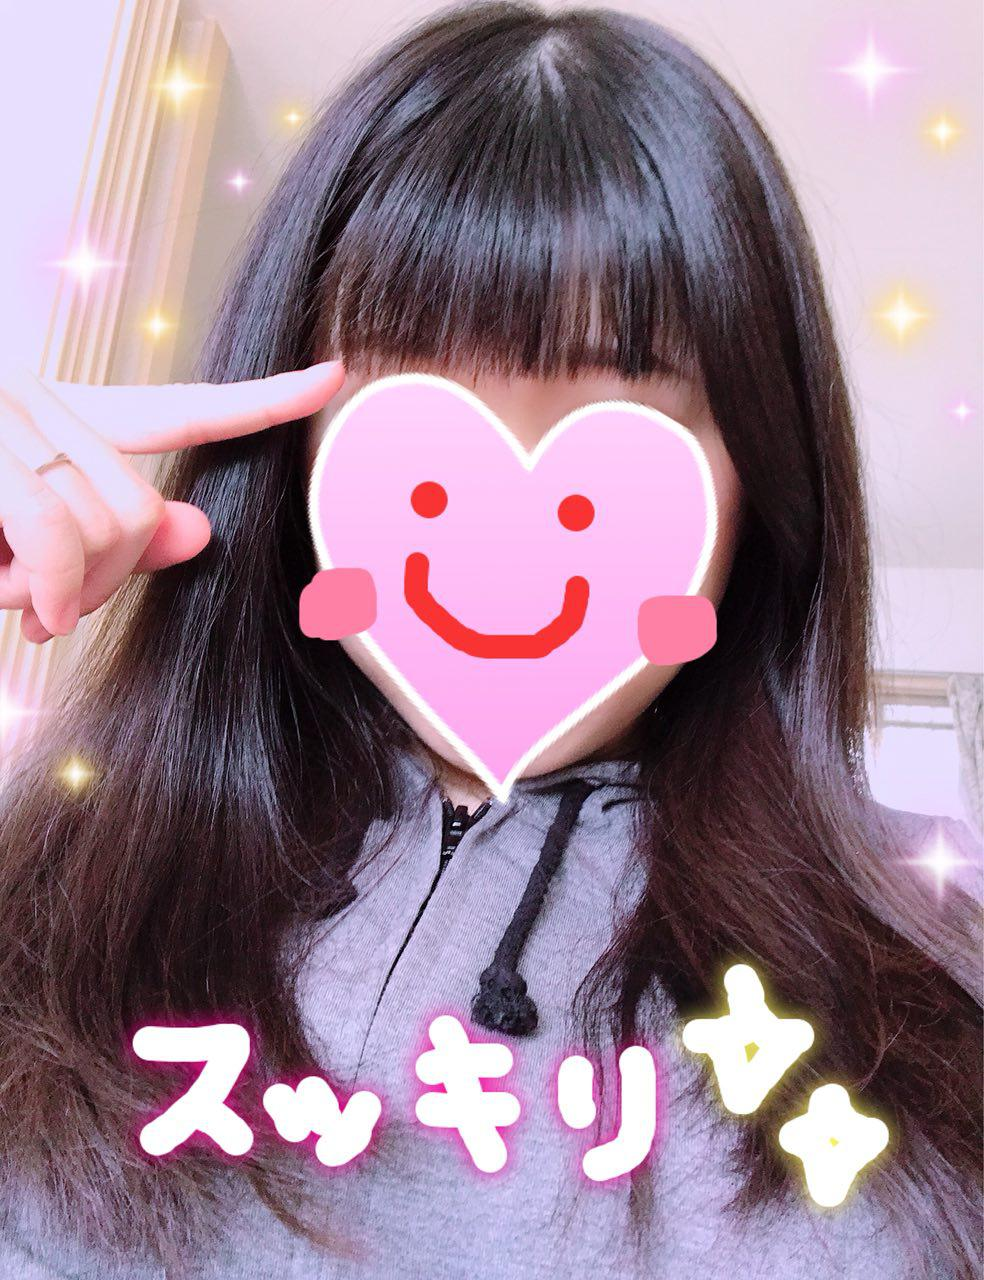 photo_2018-04-05_21-57-09.jpg